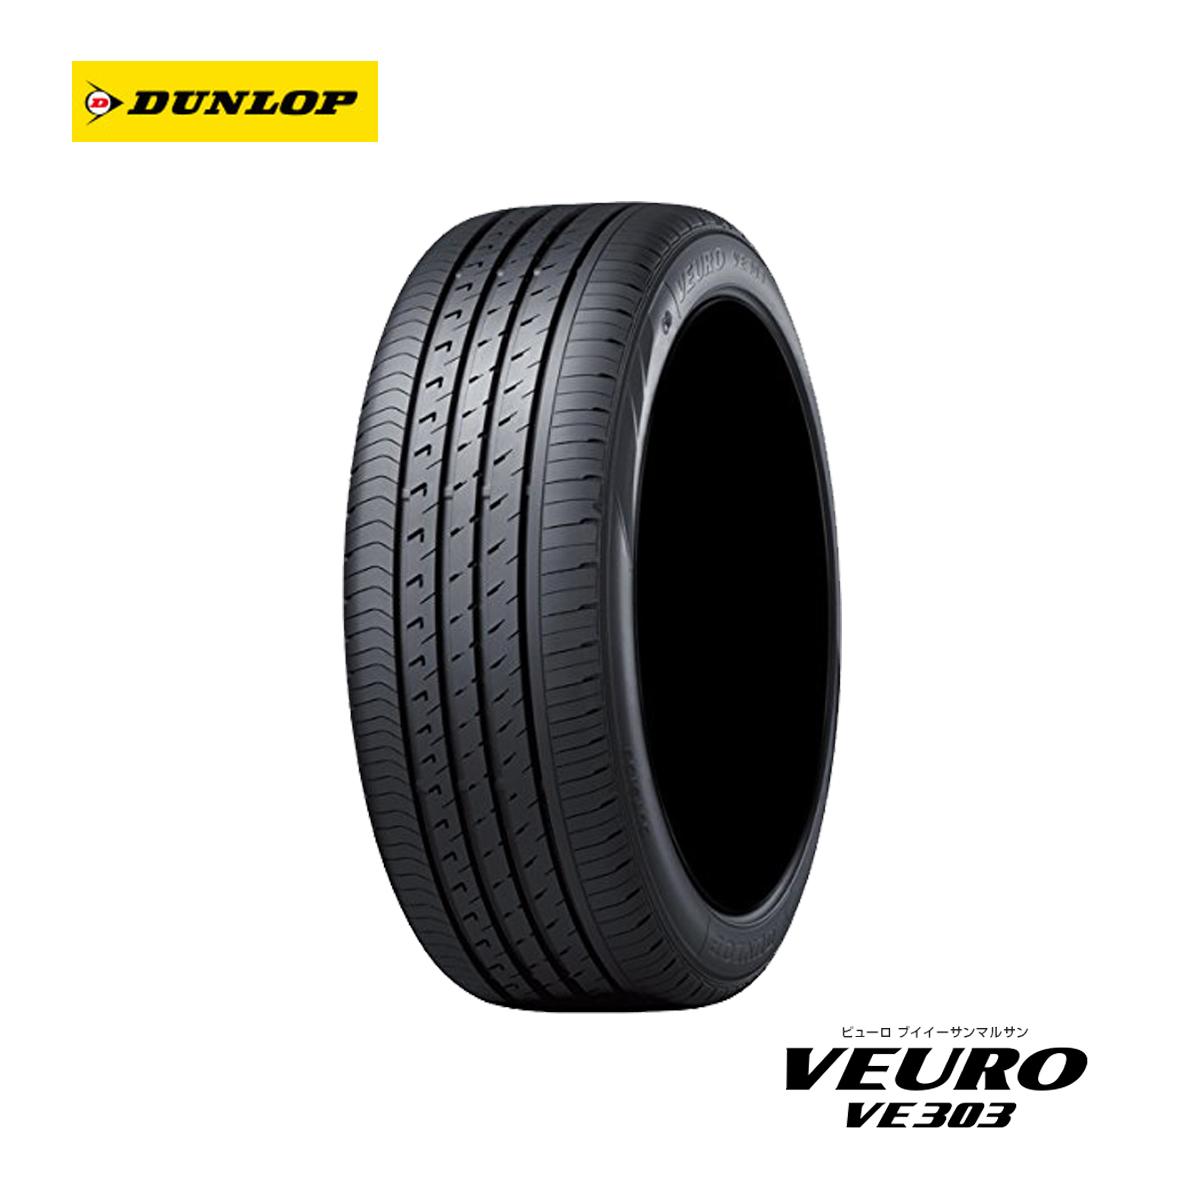 DUNLOP ダンロップ 吸音スポンジ搭載 プレミアム コンフォート 低燃費 サマータイヤ 4本 セット 19インチ 245/40R19 VEURO VE303 ビューロ